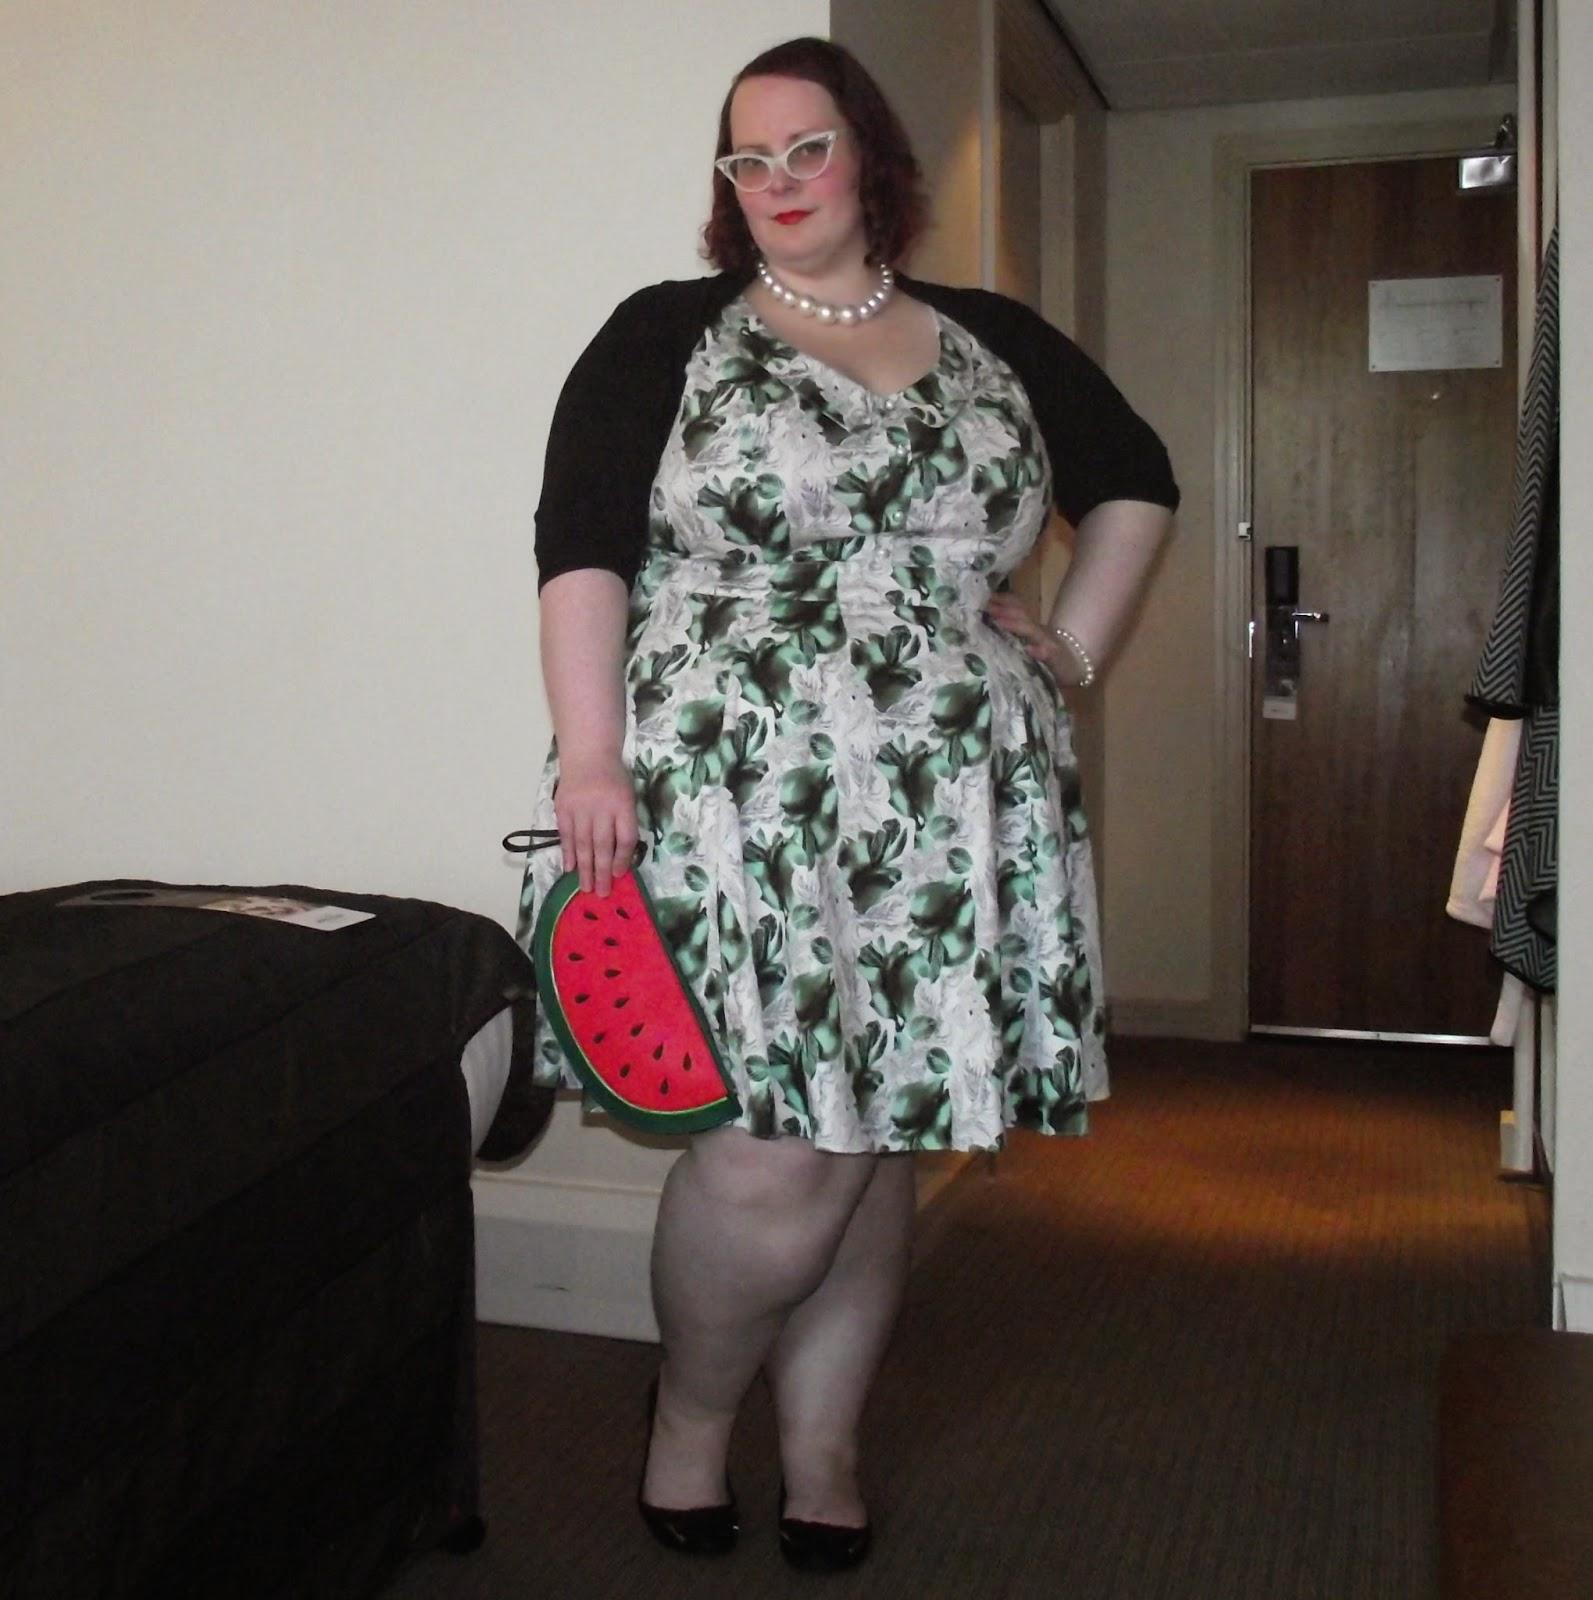 Size 26 Dress | www.imgkid.com - The Image Kid Has It!